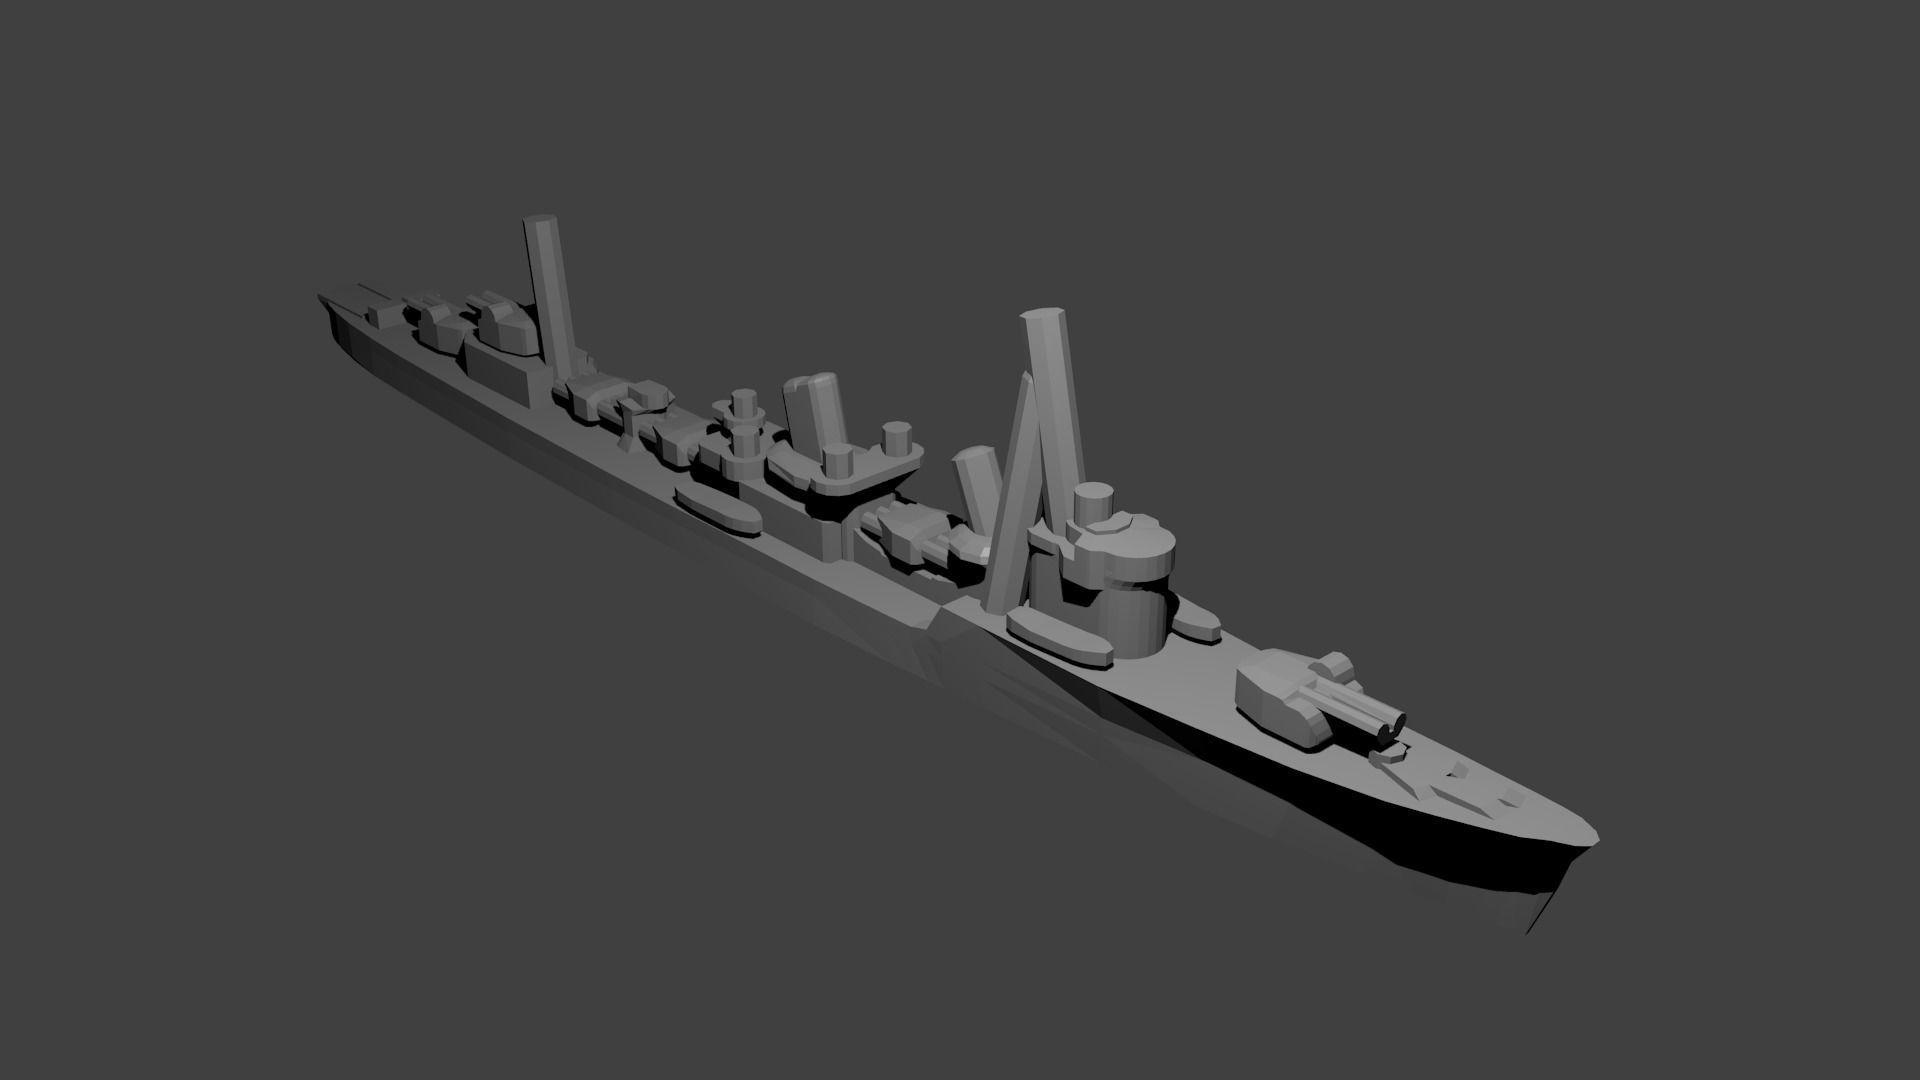 Japanese Akatsuki Class Destroyer Warship